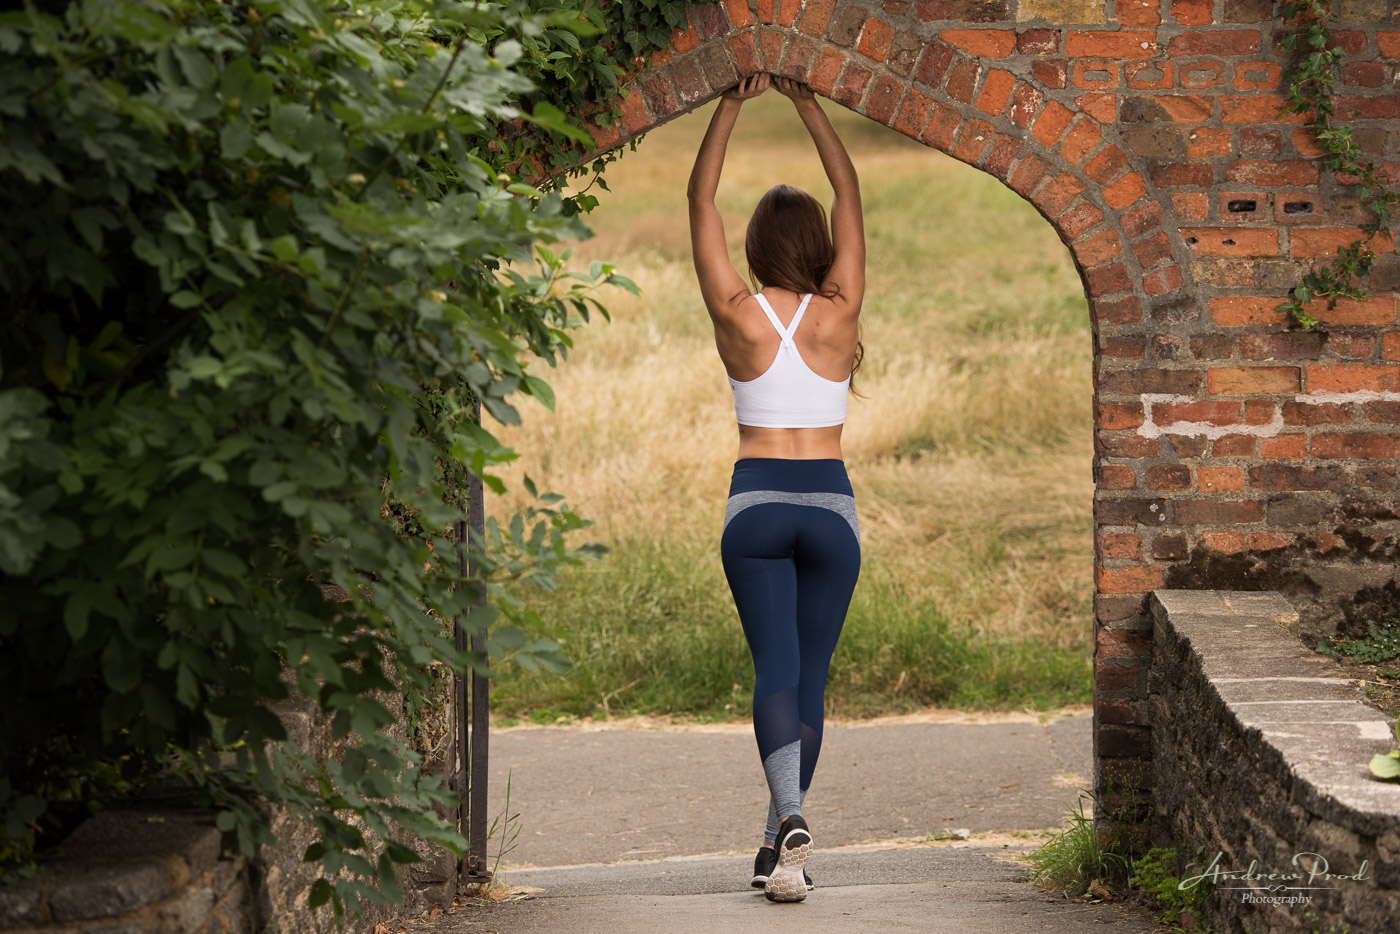 Fitness wear photoshoot